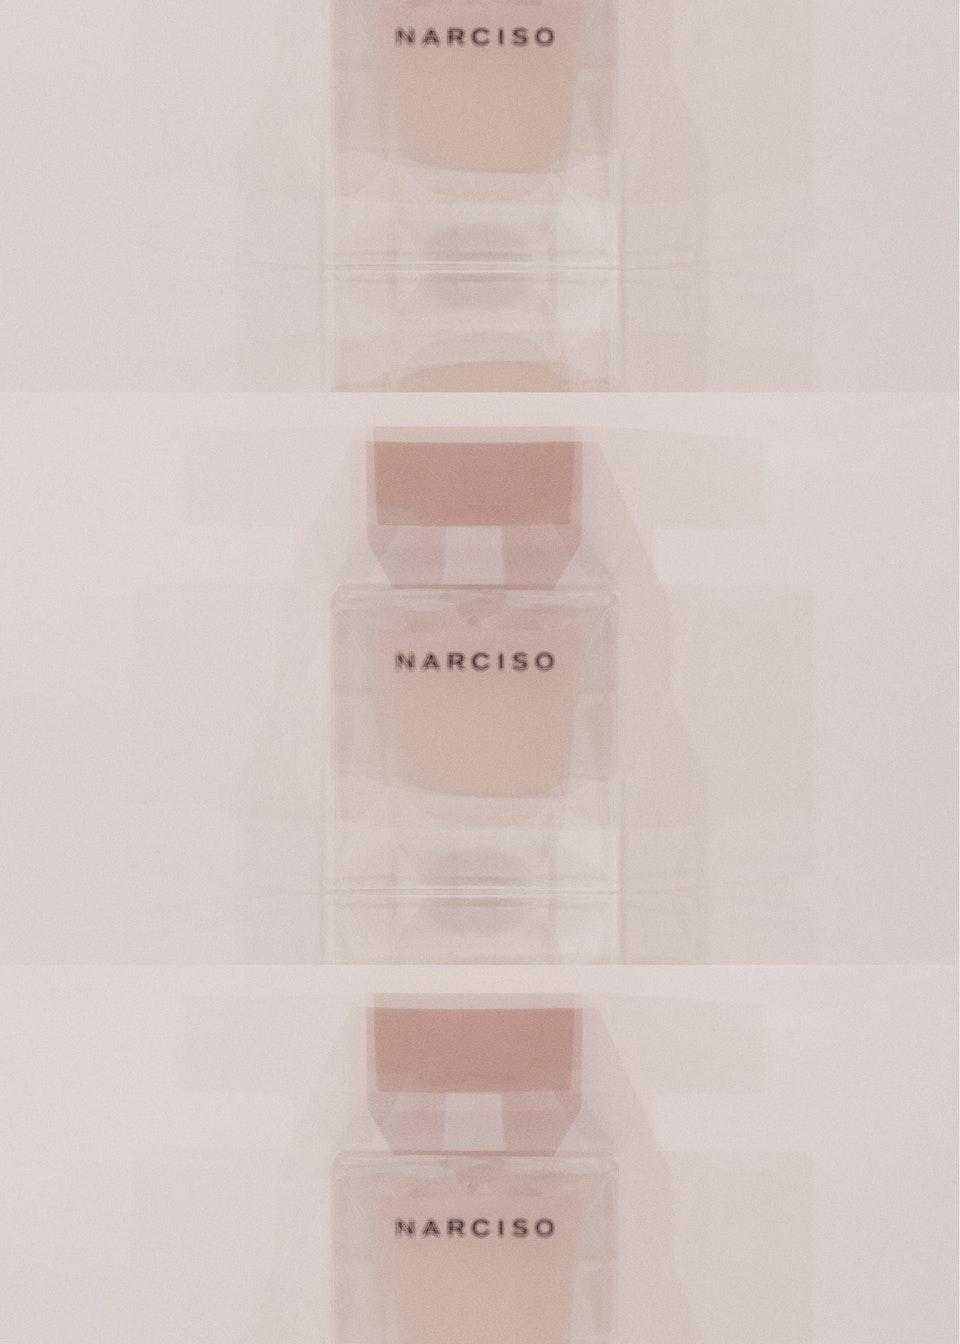 Narciso Rodriguez Perfume - Stills BLOOM_NARCISO_PARFUM_5